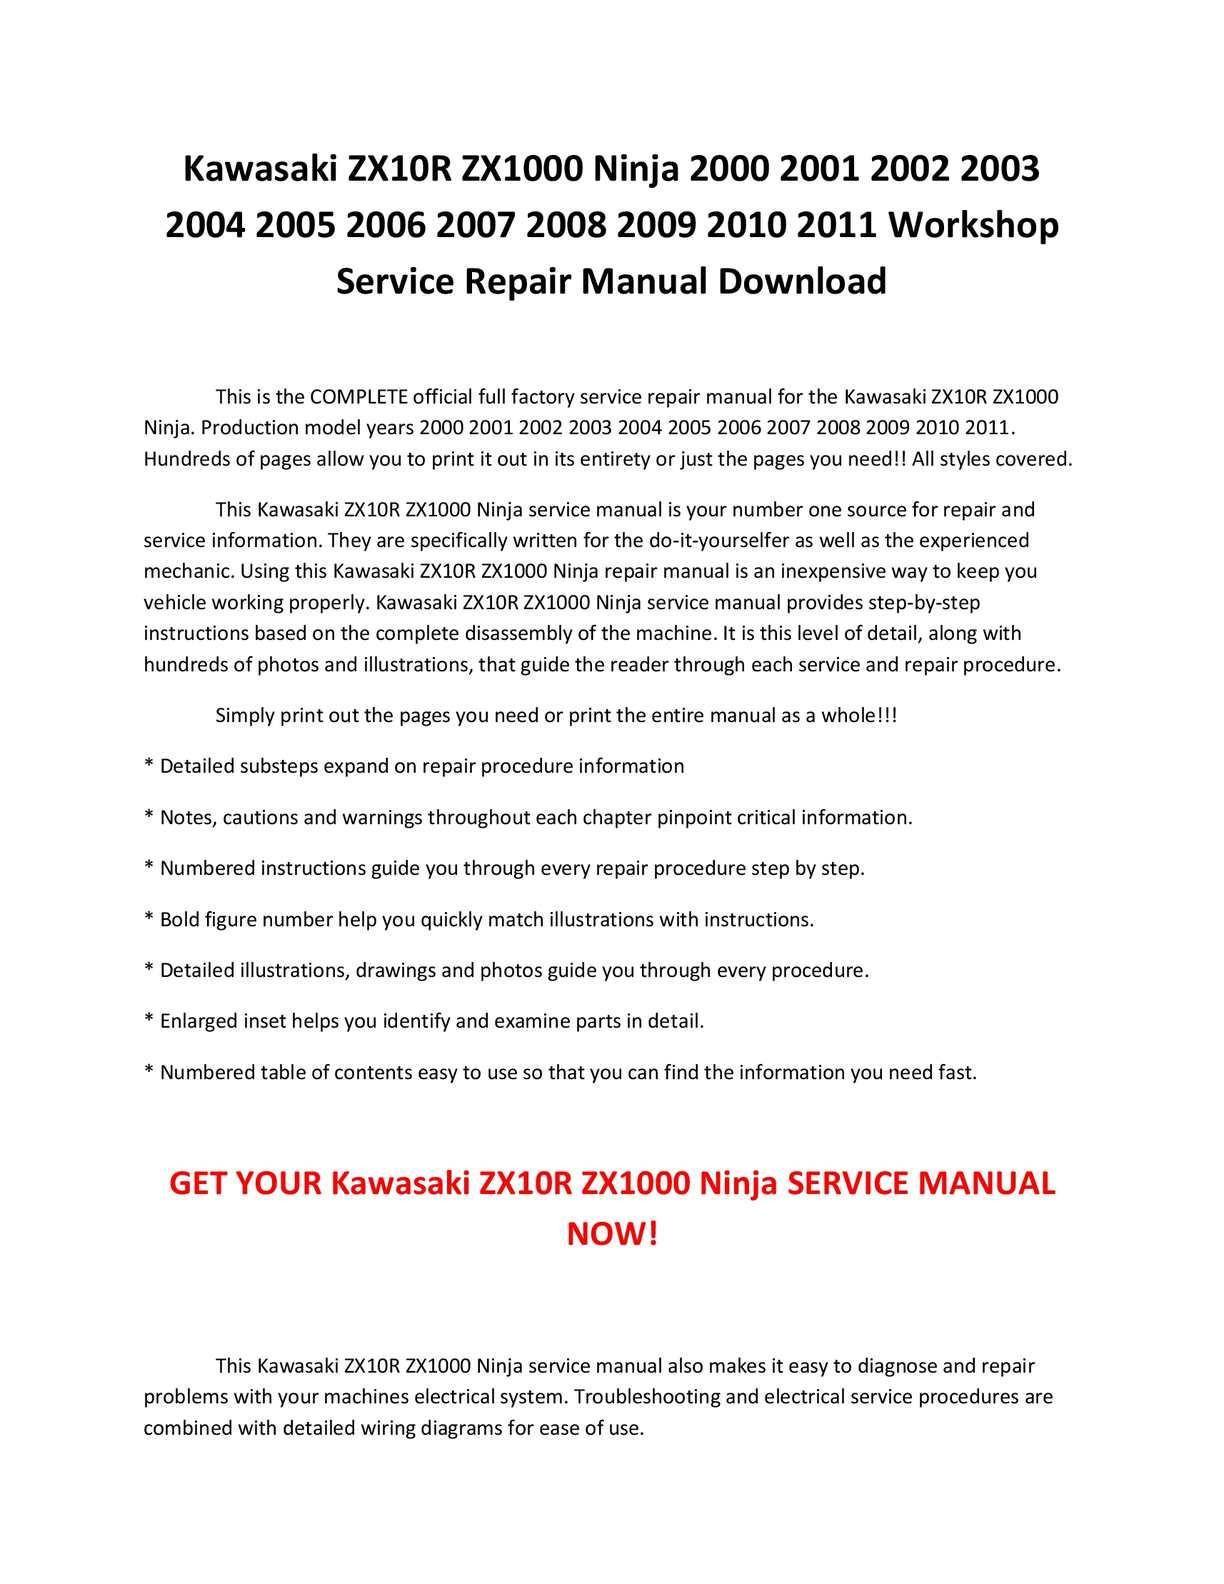 calaméo kawasaki zx10r zx1000 ninja 2000 2001 2002 2003 2004 calaméo kawasaki zx10r zx1000 ninja 2000 2001 2002 2003 2004 2005 2006 2007 2008 2009 2010 2011 service repair manual pdf